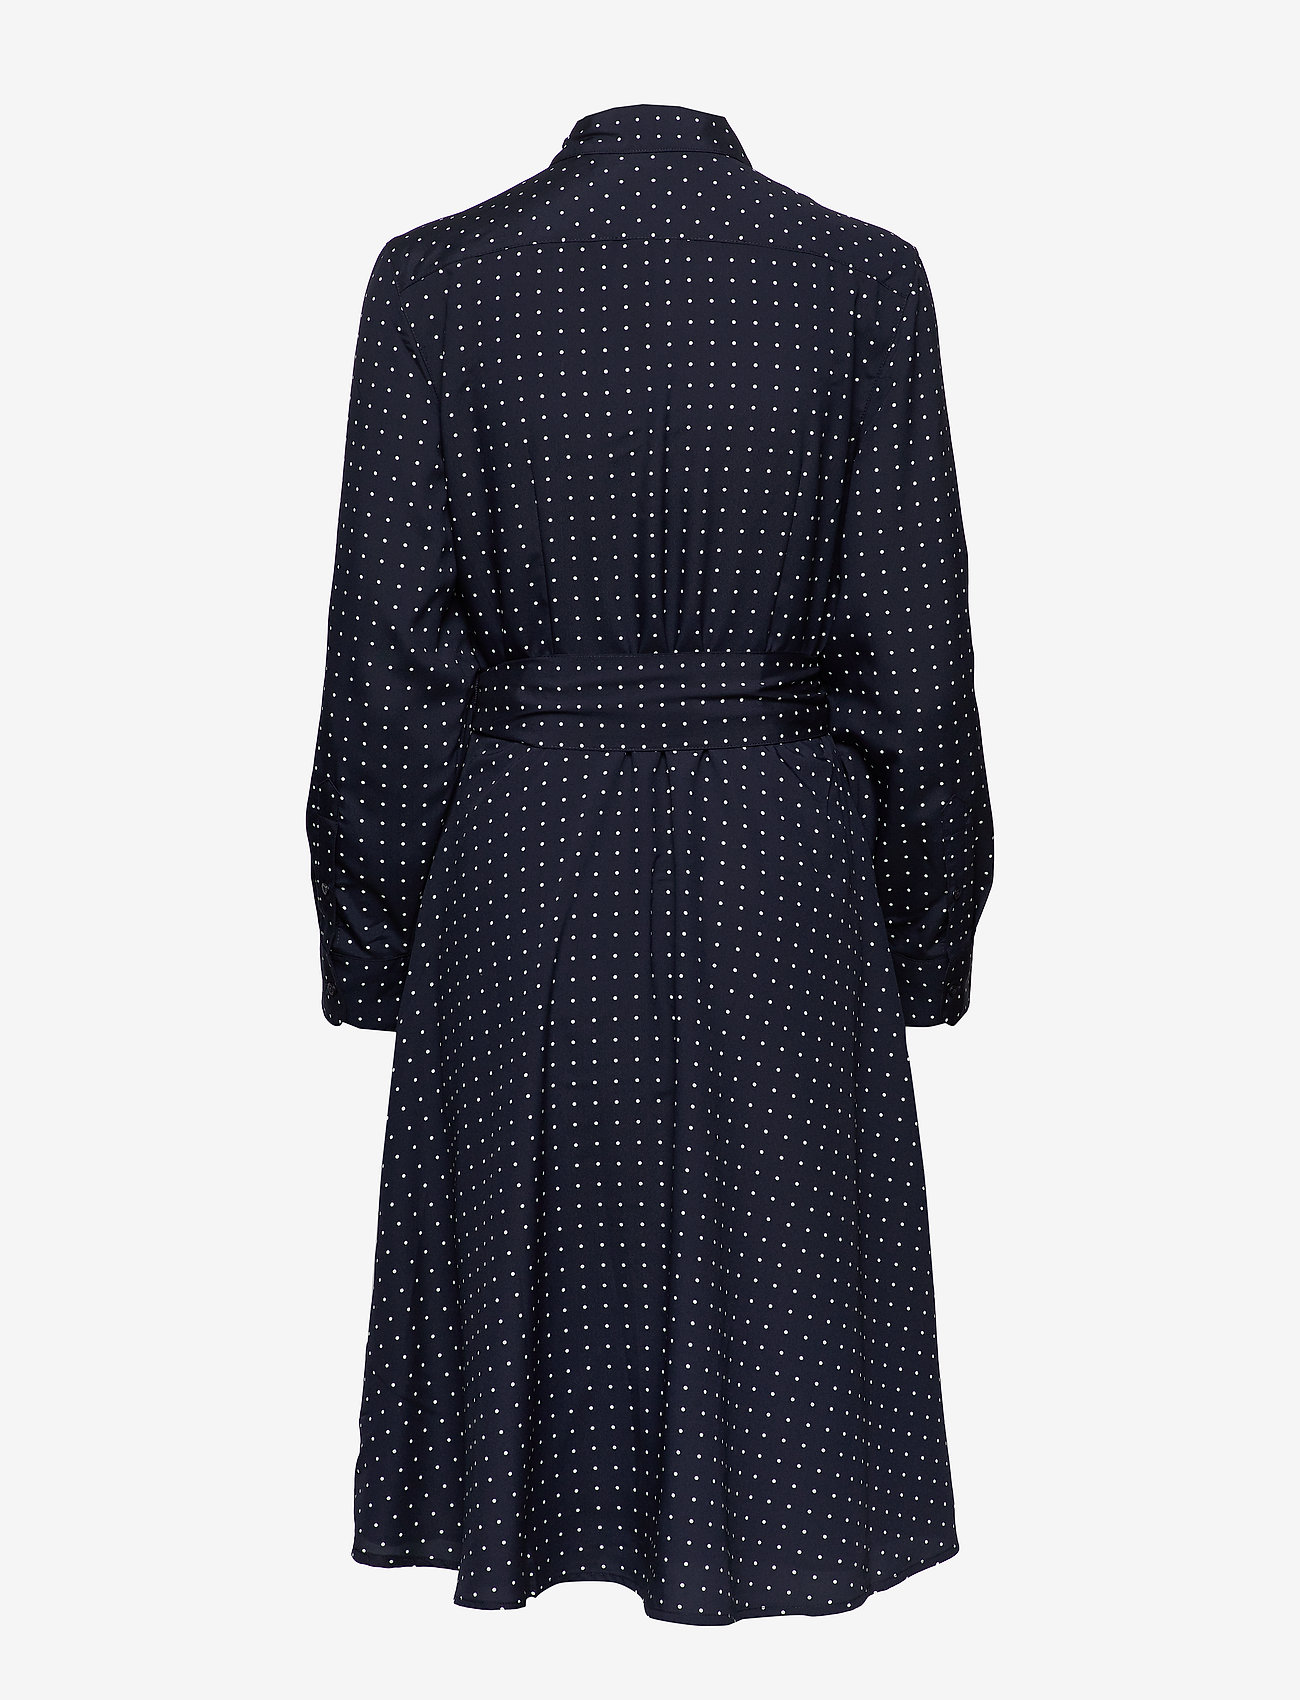 Lauren Ralph Lauren Print Long-Sleeve Shirtdress - Sukienki LAUREN NAVY/SILK - Kobiety Odzież.